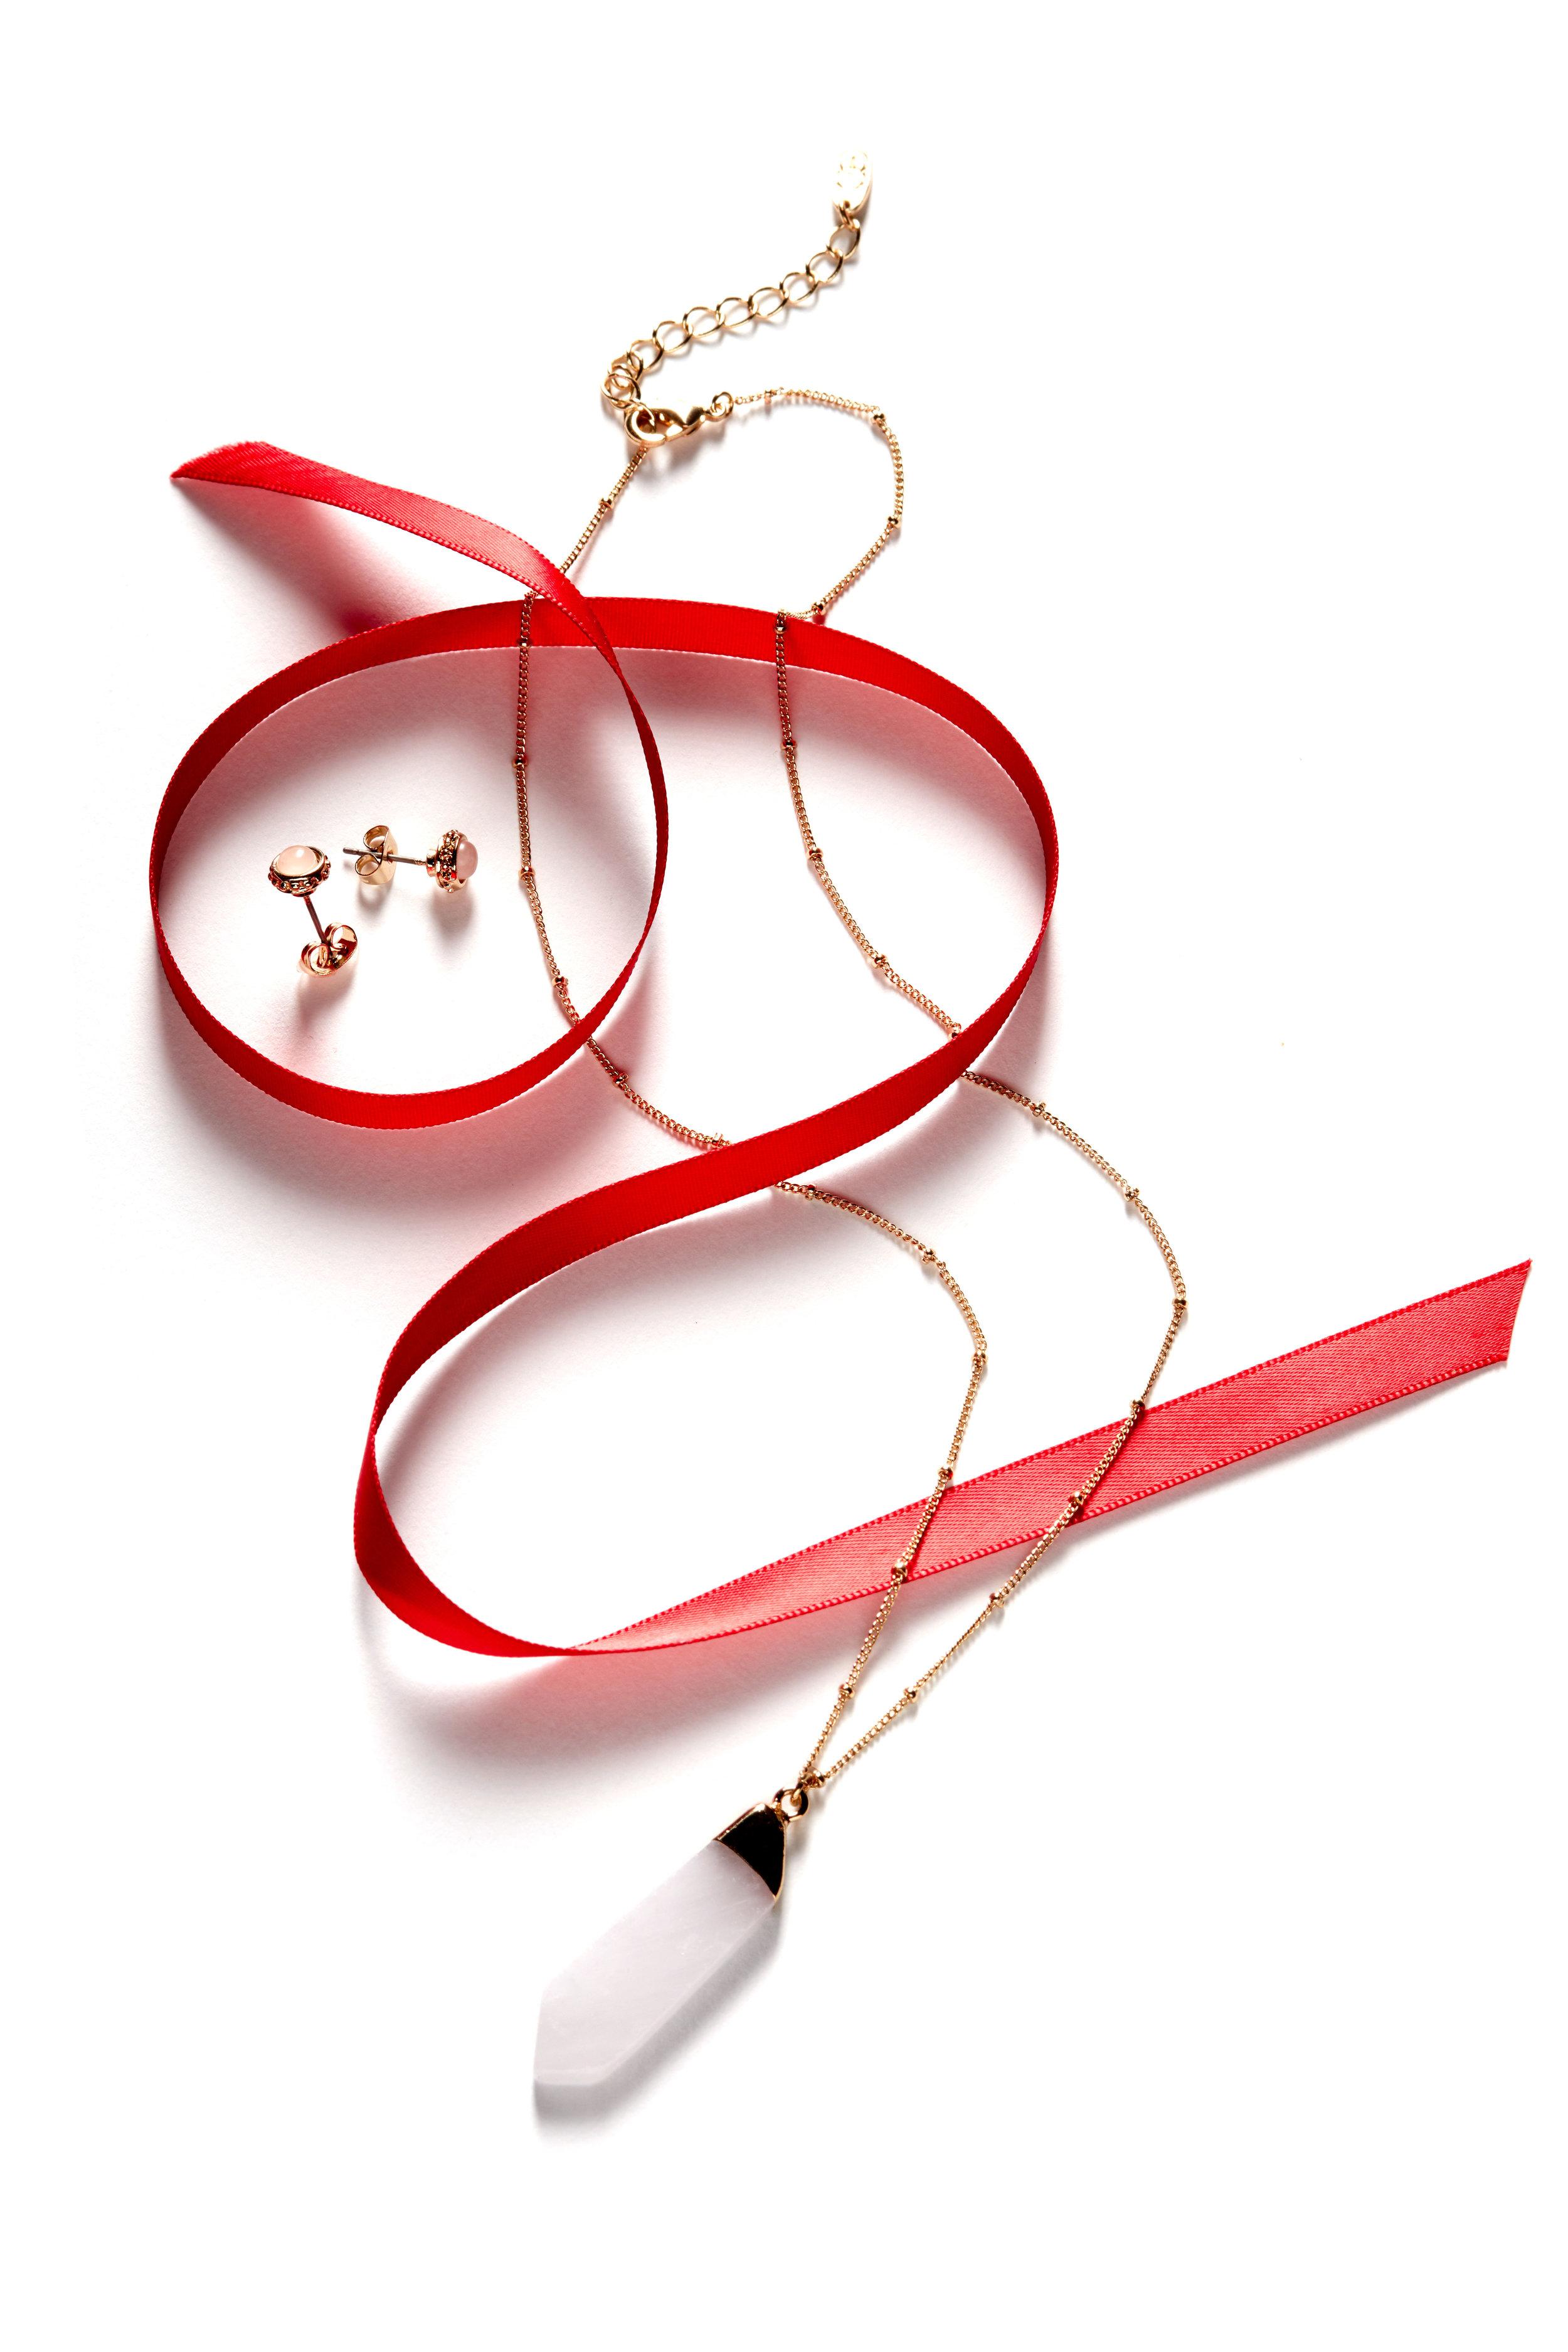 11November27_Gifts_We_love_BP_KM6136_MAIN.jpg